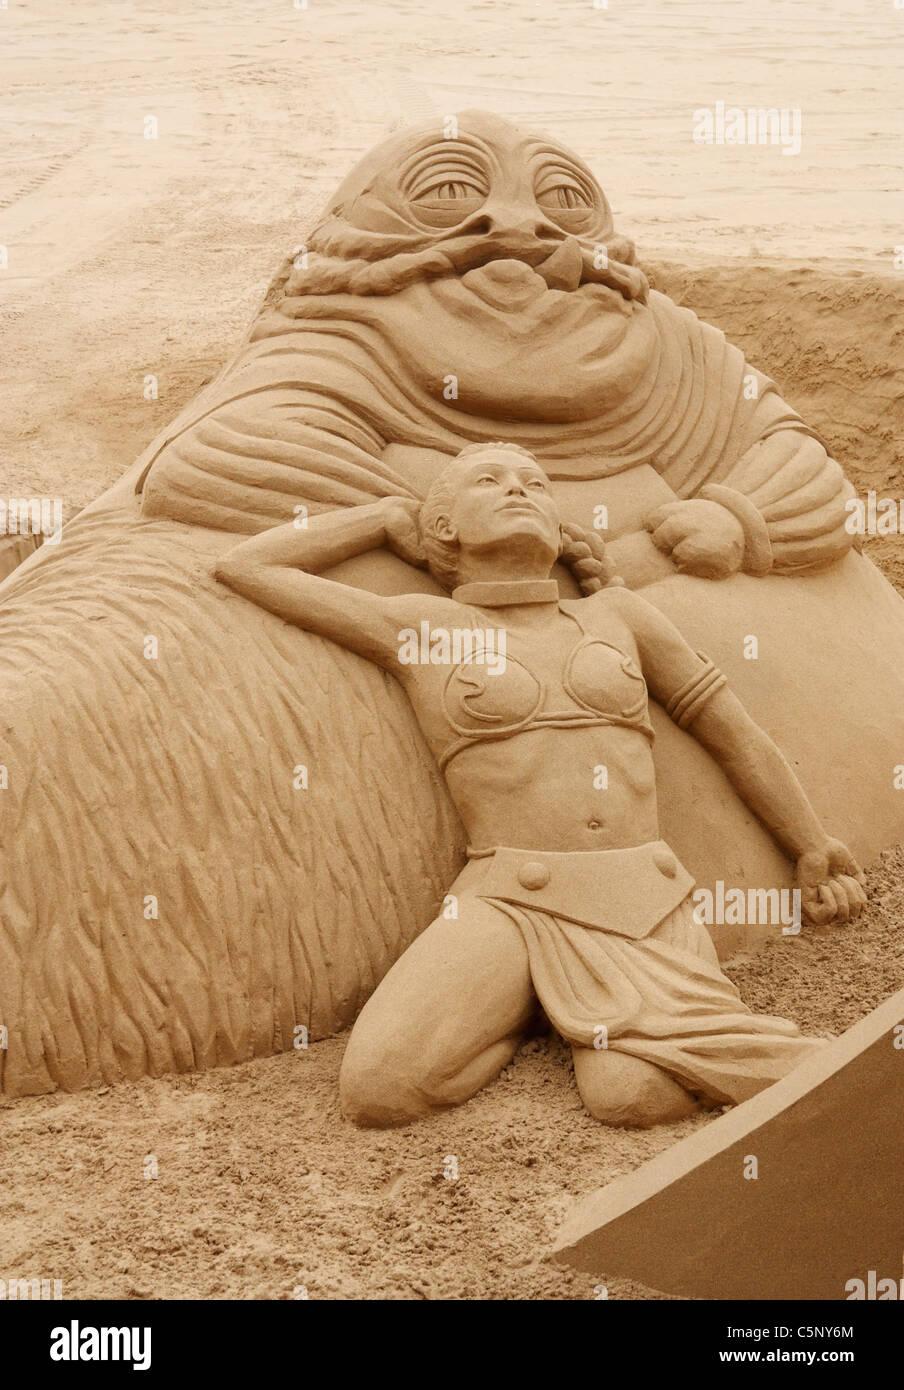 star wars sand sculpture on beach in spain stock photo 37976364 alamy